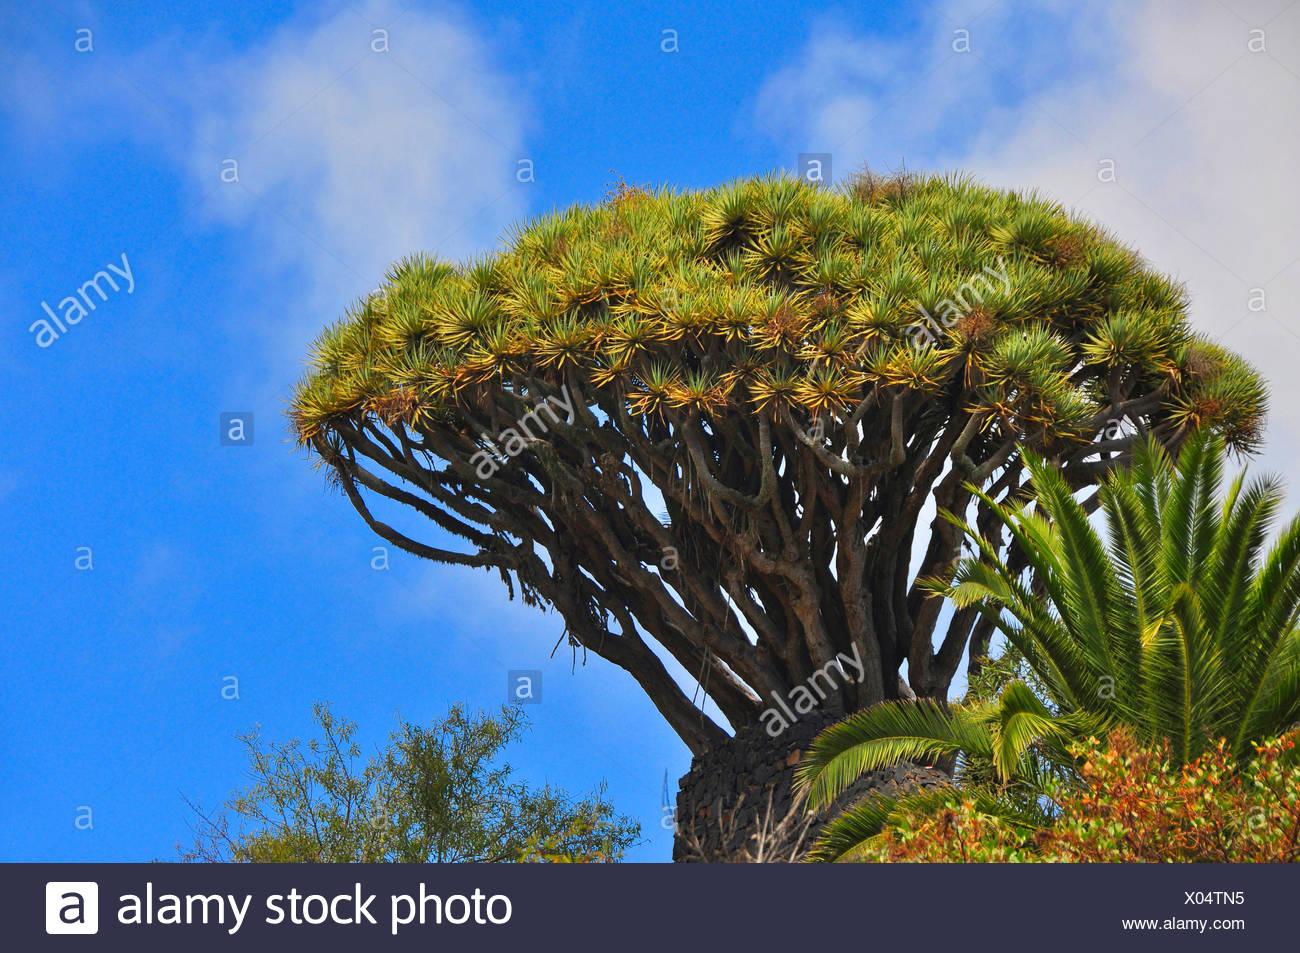 Tear Dragon's blood, Draegon Tree, Canary Islands Dragon Tree, Drago  (Dracaena draco), tree crown, Canary Islands, La Palma - Stock Image